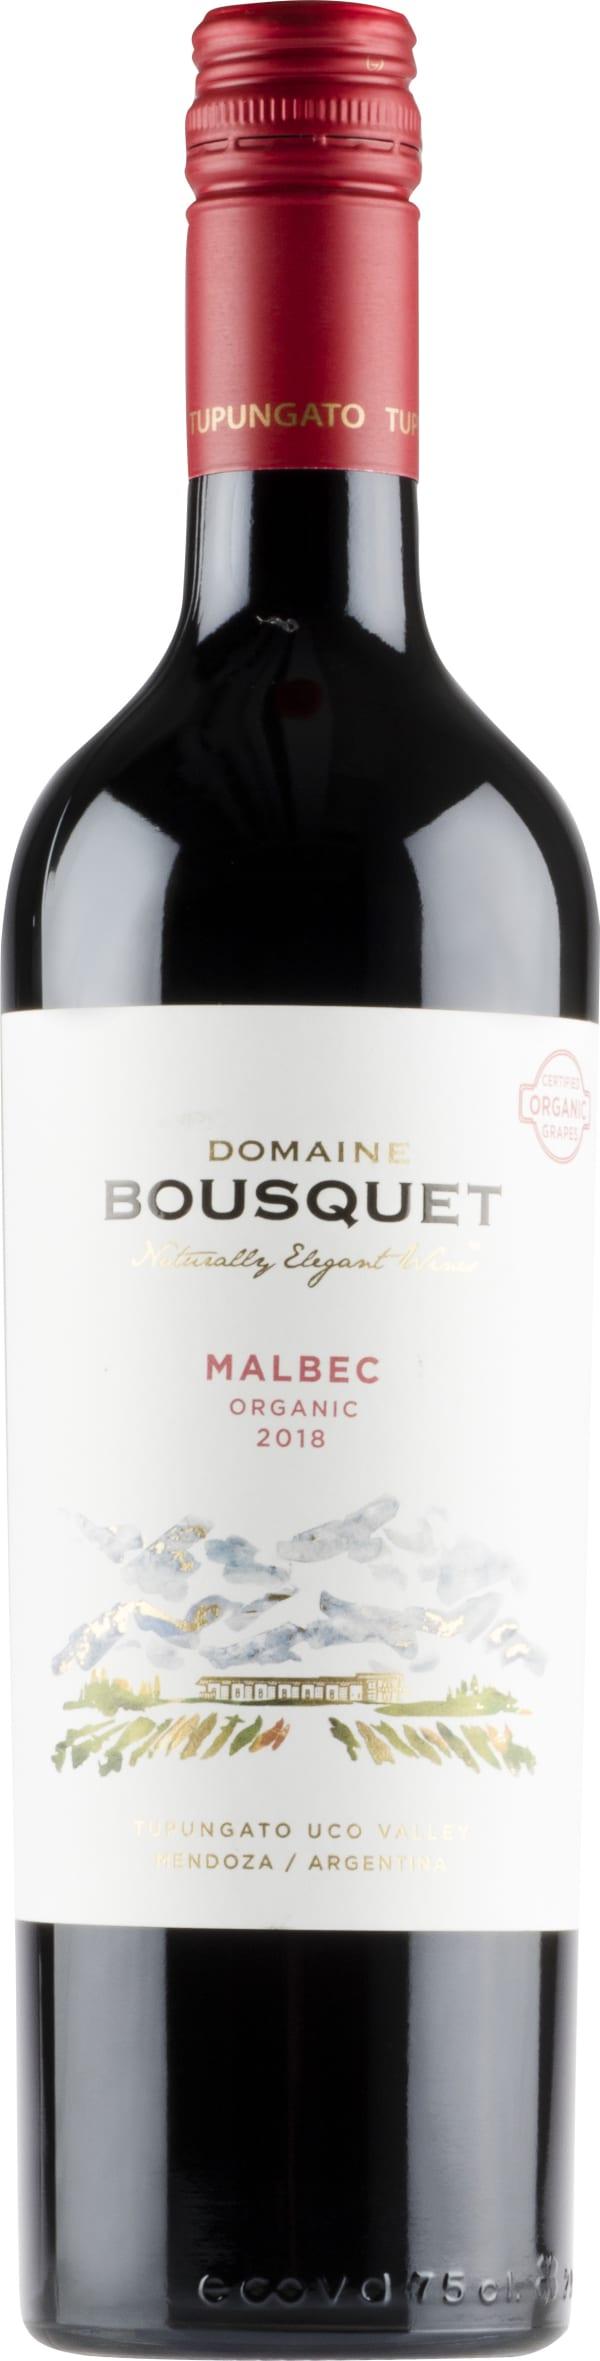 Domaine Bousquet Malbec Organic 2016